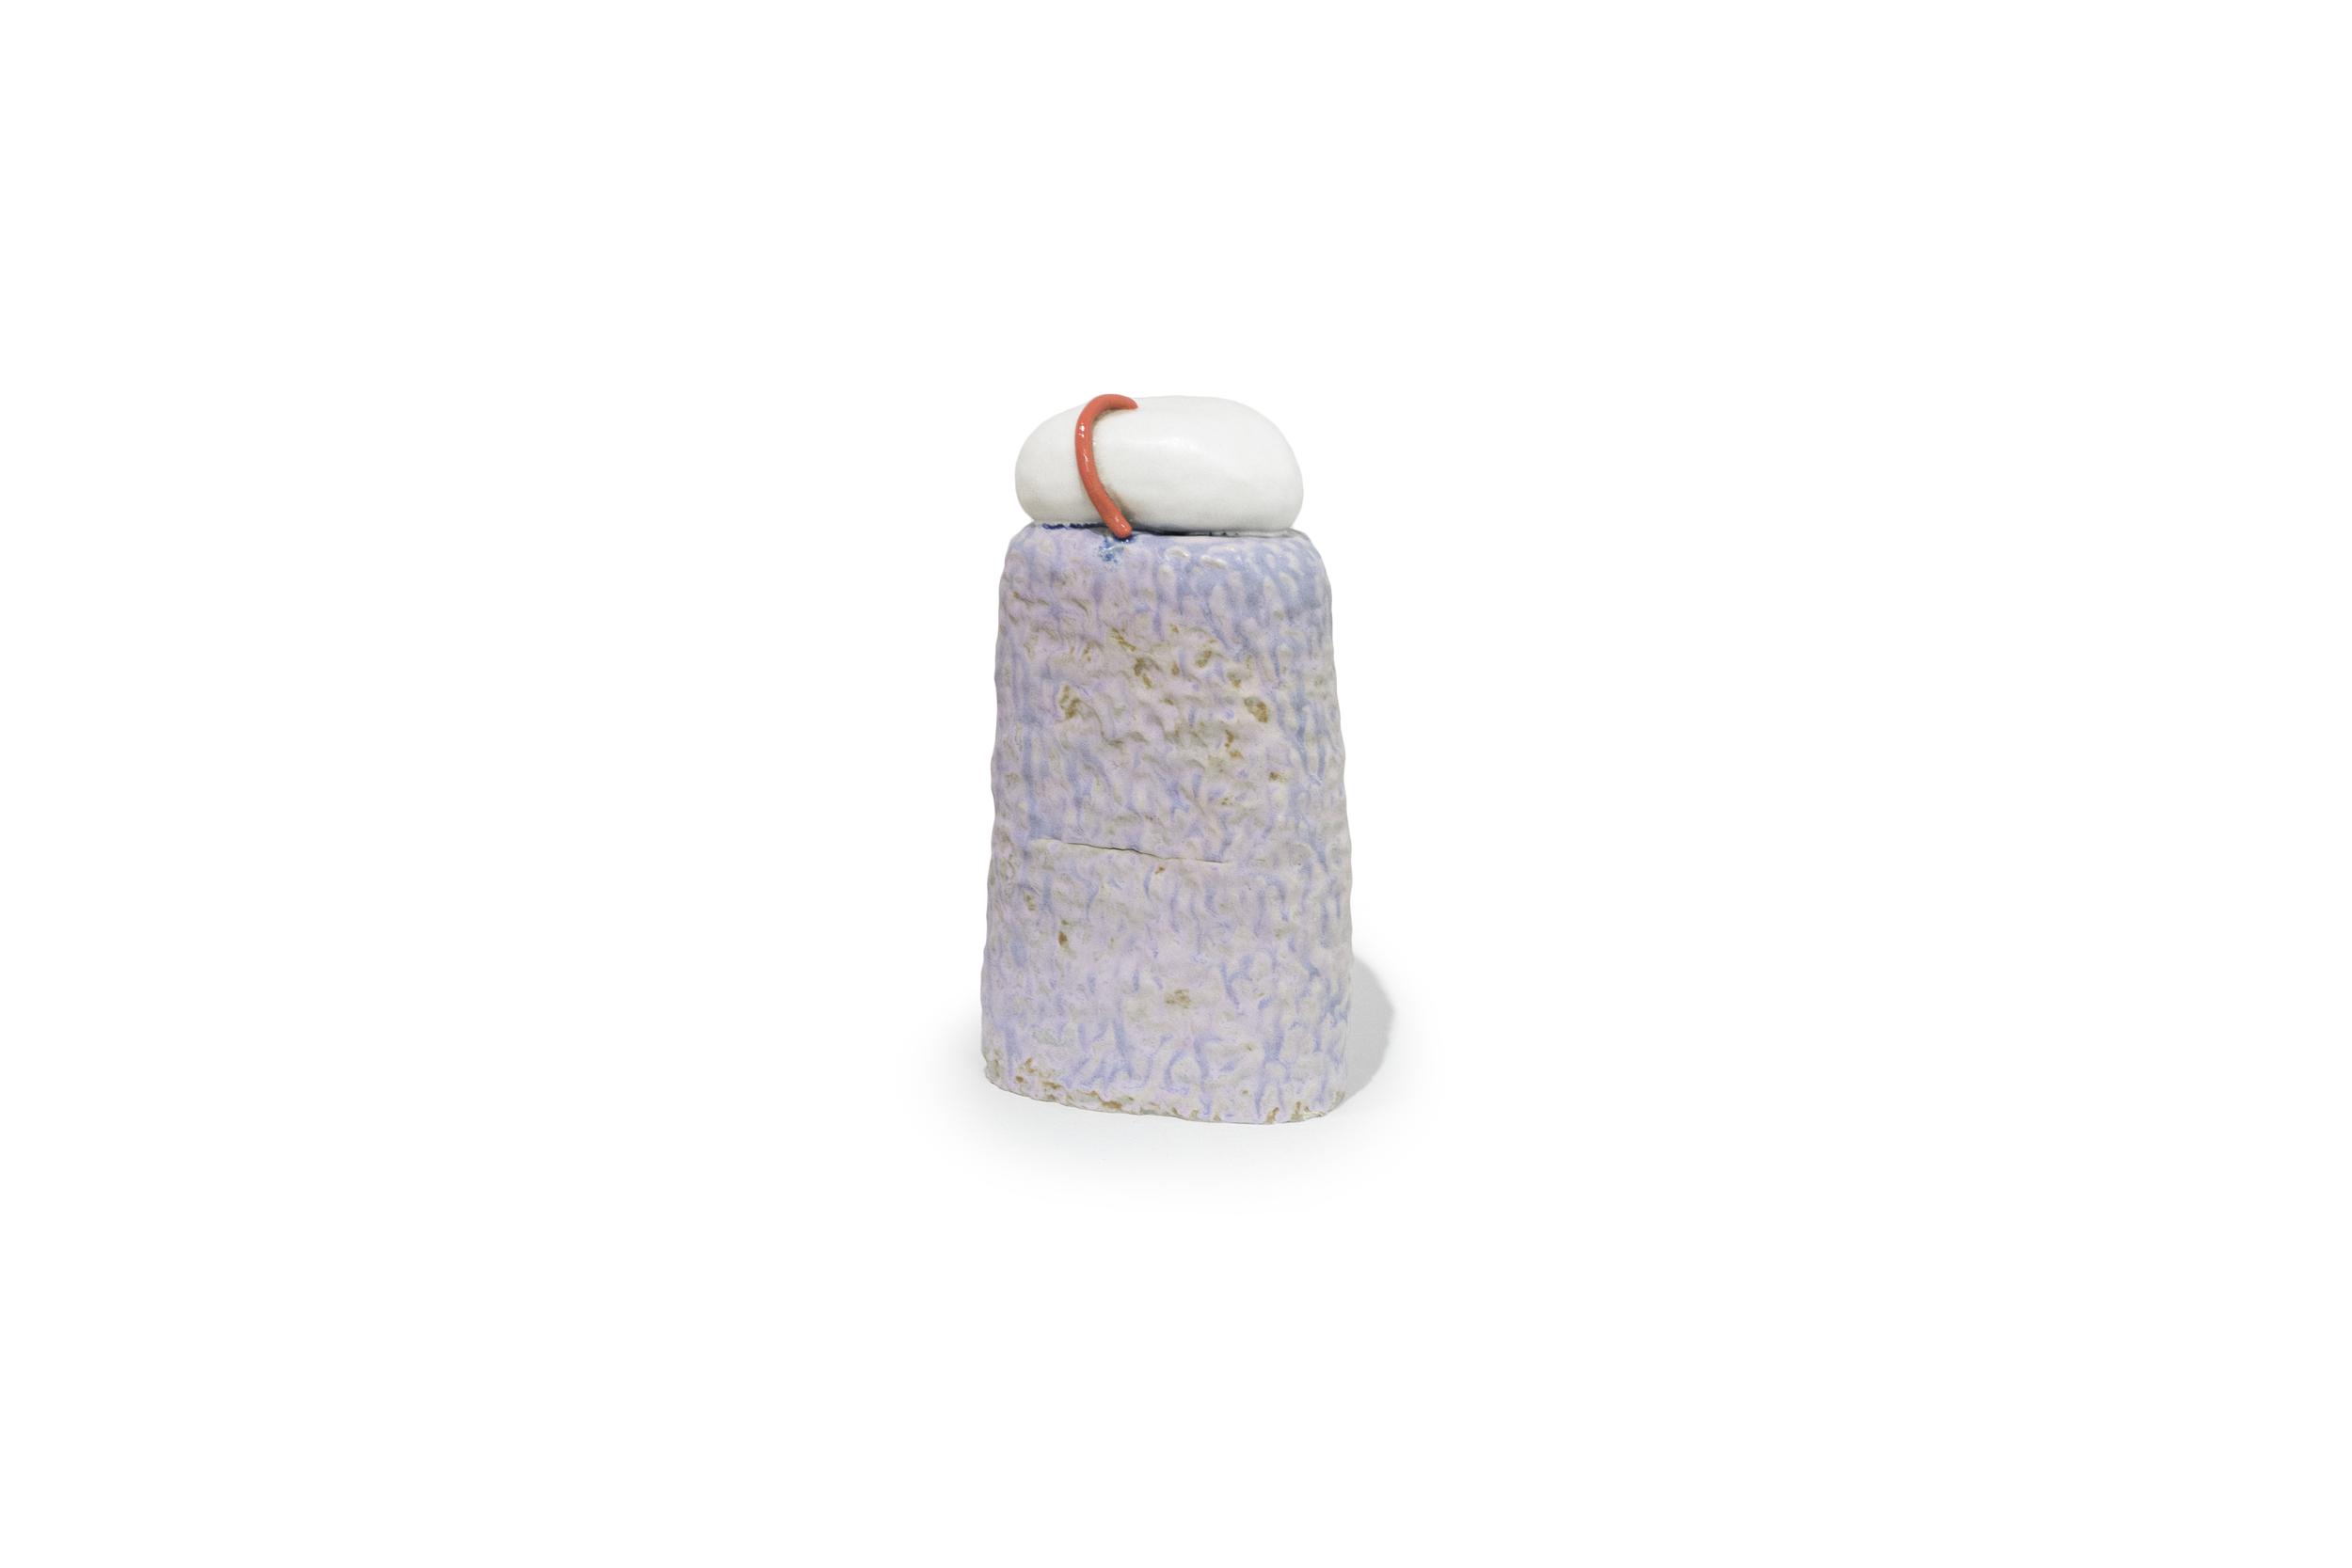 "Untitled:  11x5x5""  ceramic"